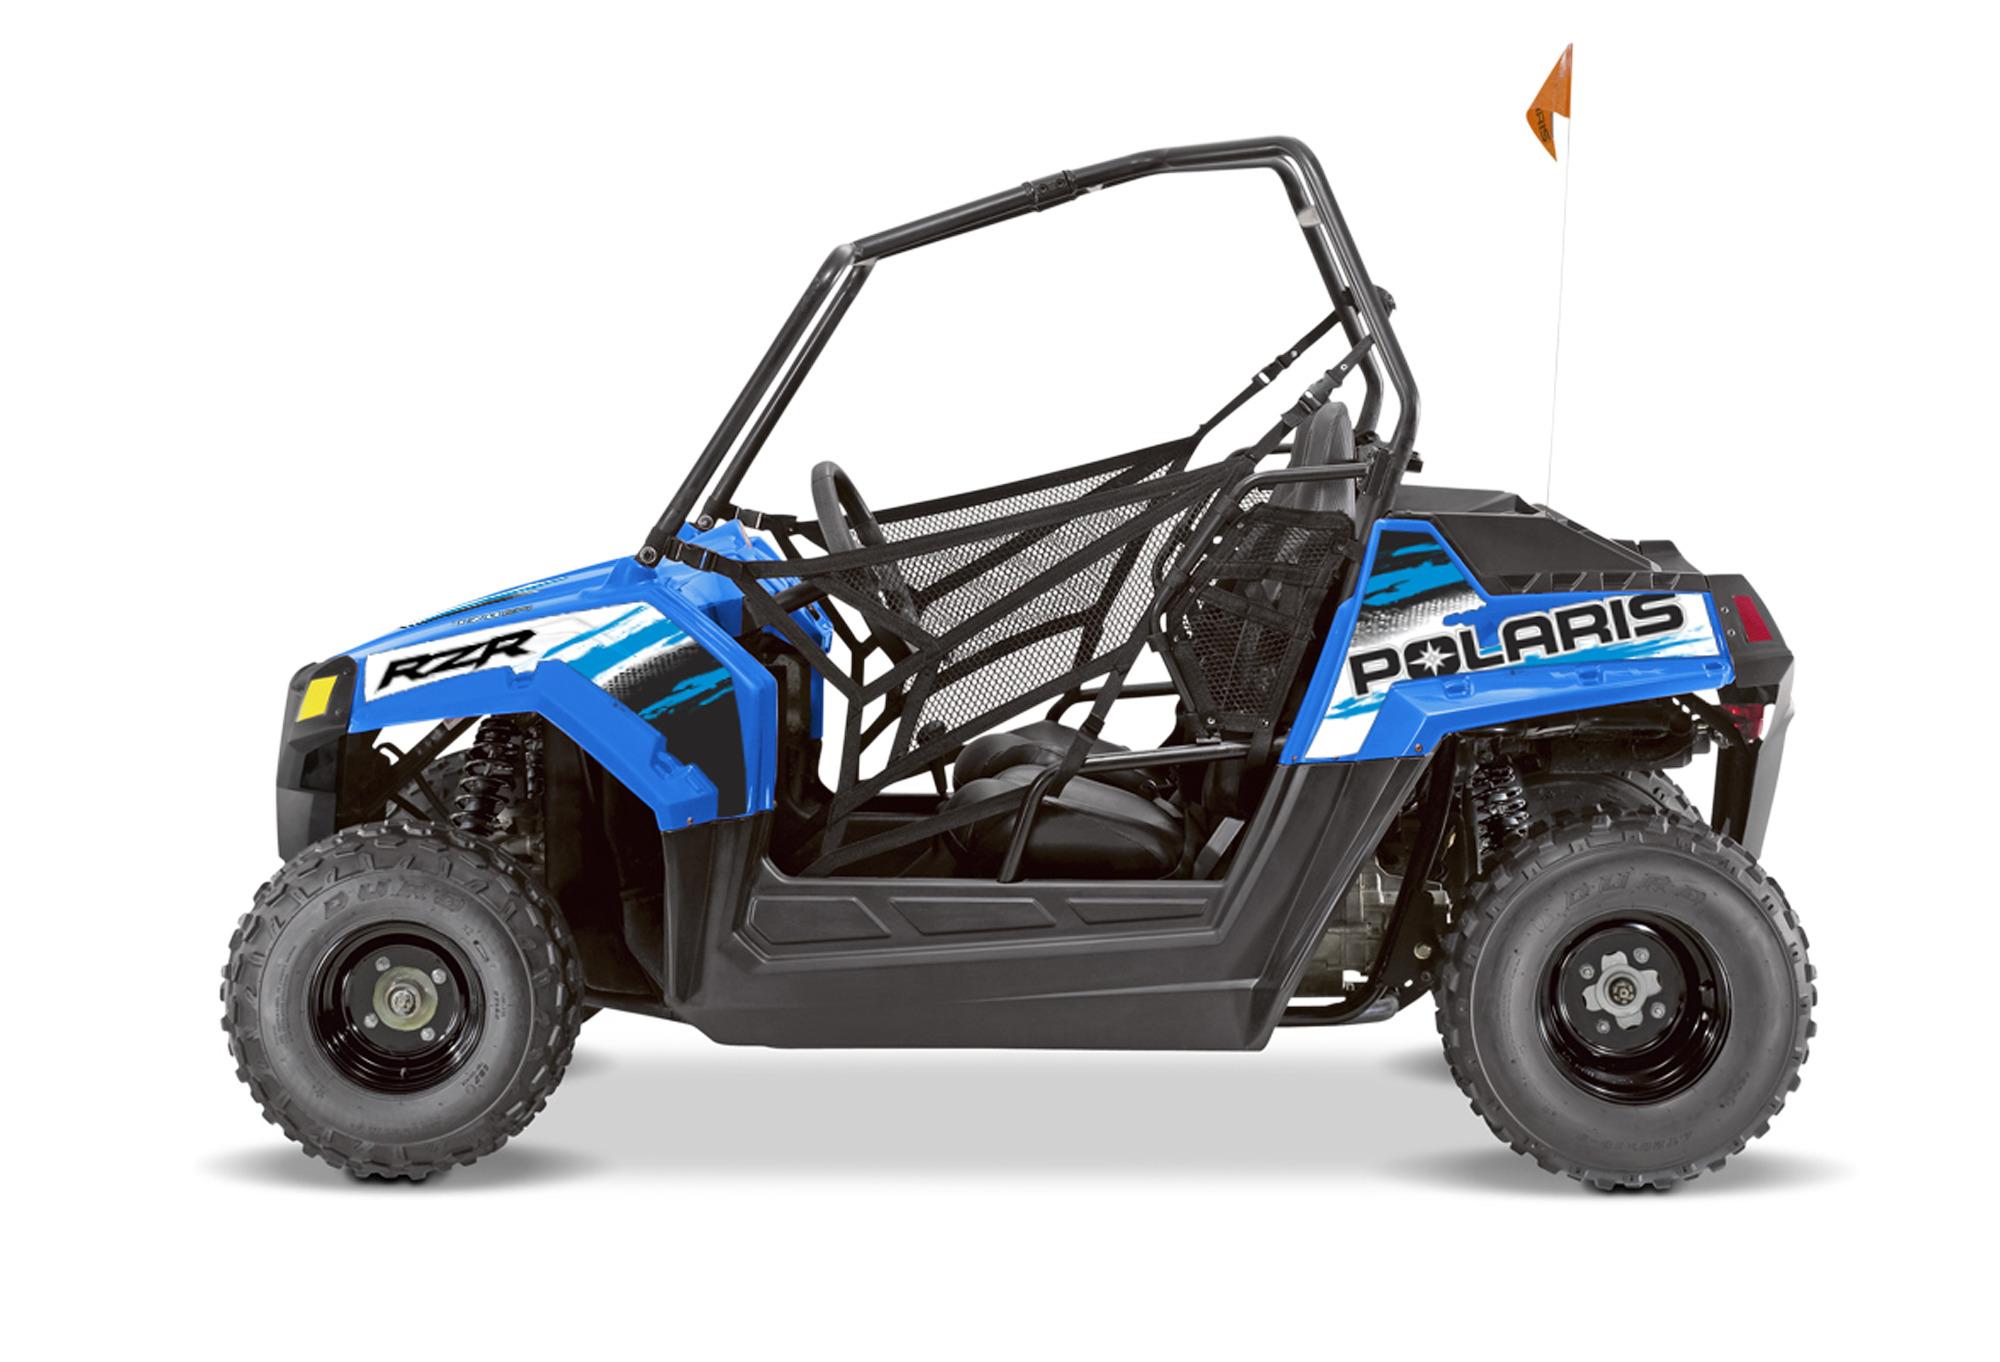 medium resolution of polaris recalls rzr 170 recreational off highway vehicles due to 2014 polaris rzr 170 wiring diagram